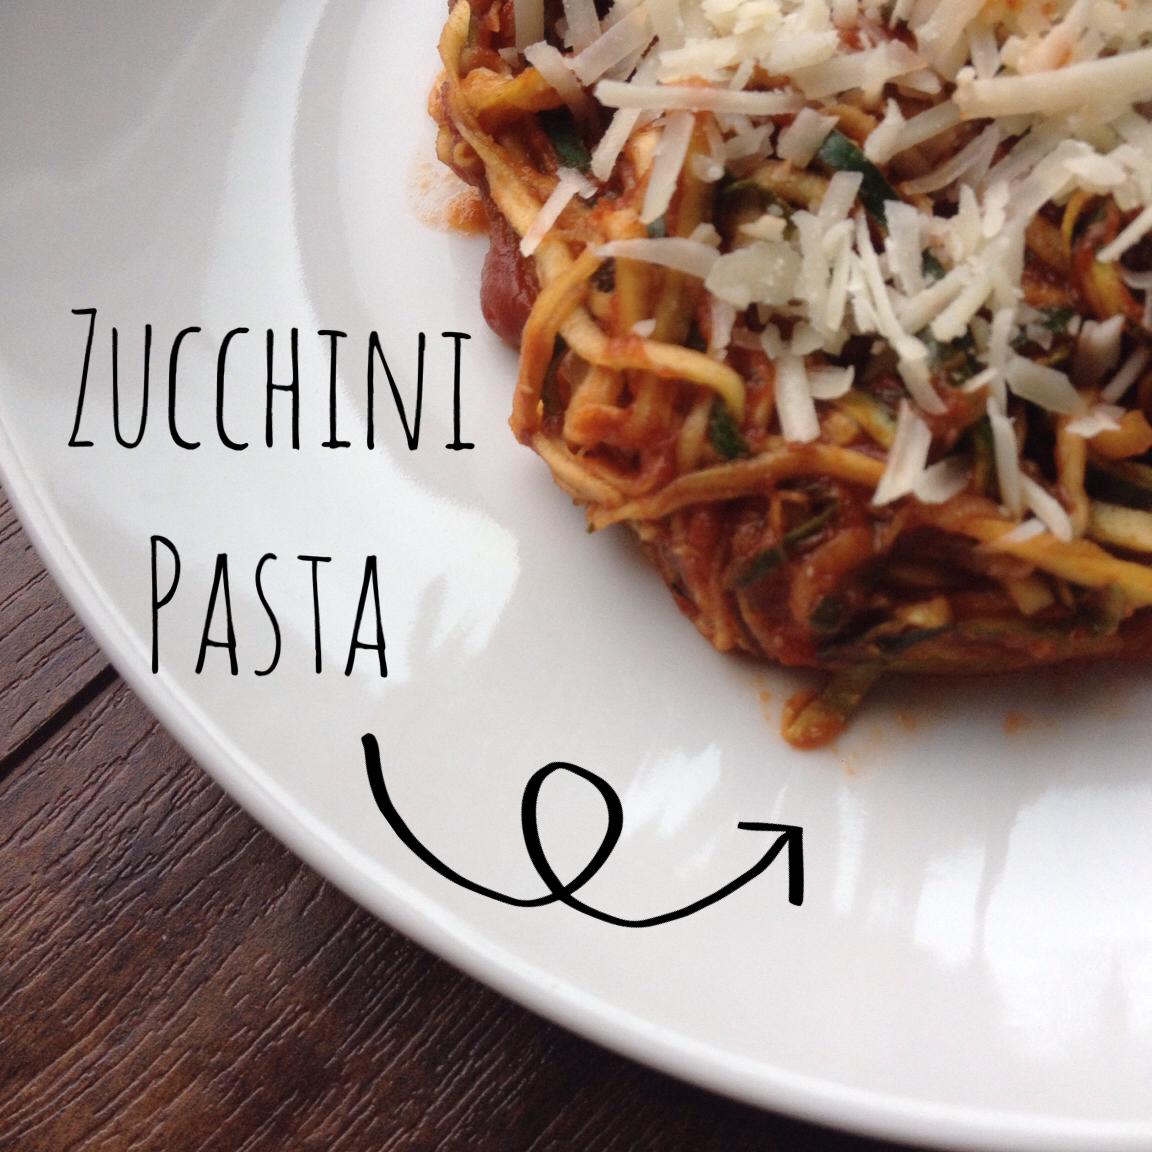 zucchini pasta. Black Bedroom Furniture Sets. Home Design Ideas